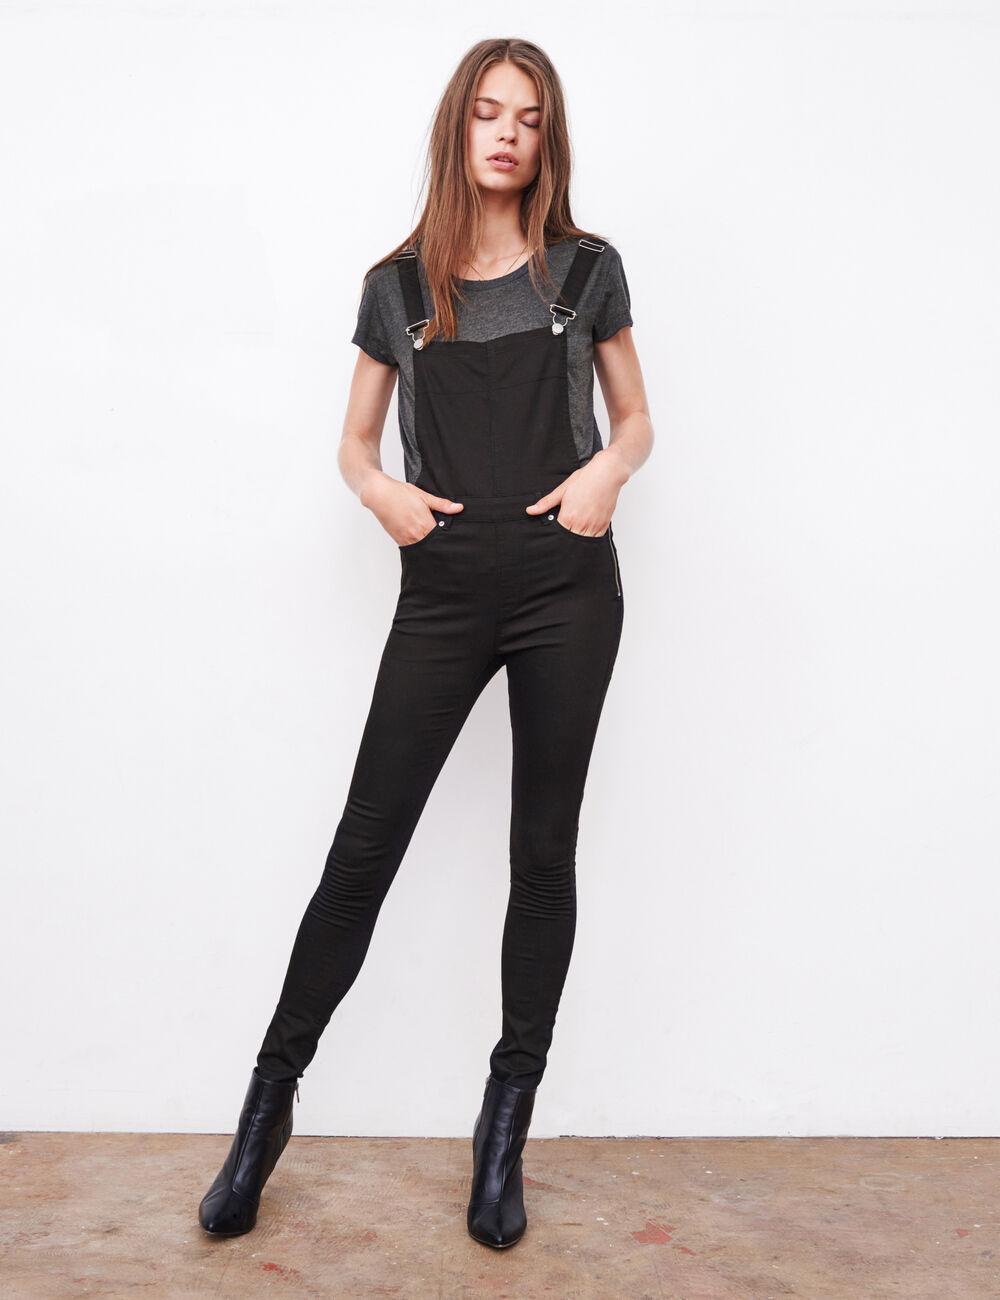 salopette taille haute noire femme jennyfer. Black Bedroom Furniture Sets. Home Design Ideas